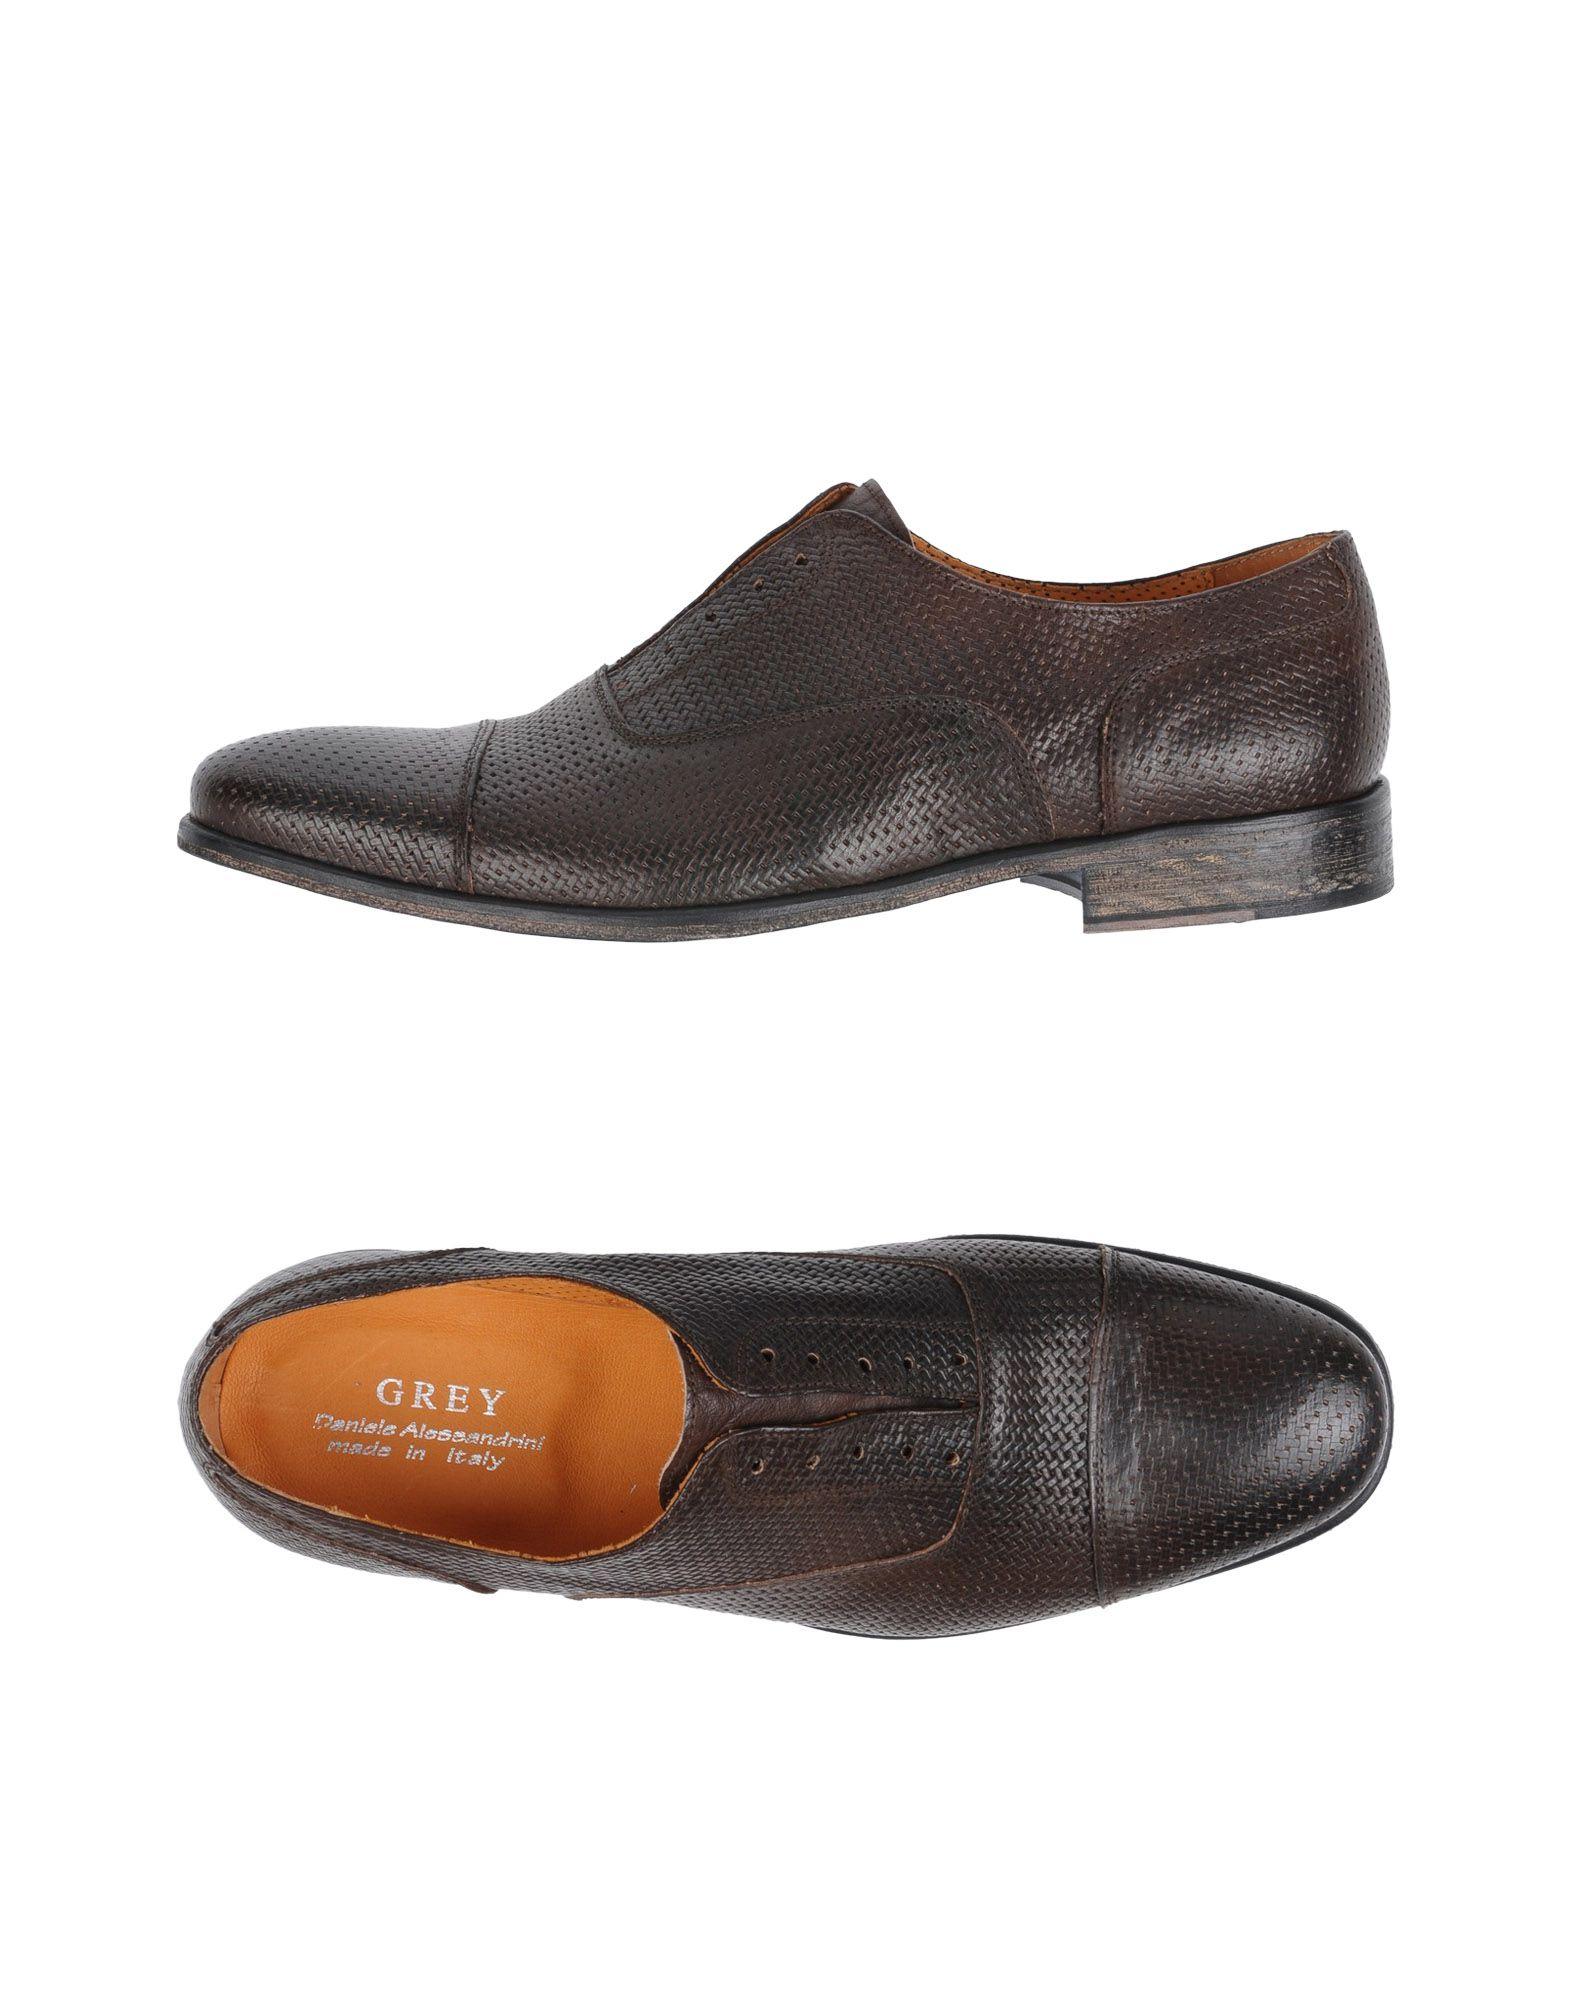 GREY DANIELE ALESSANDRINI Обувь на шнурках водолазка daniele alessandrini